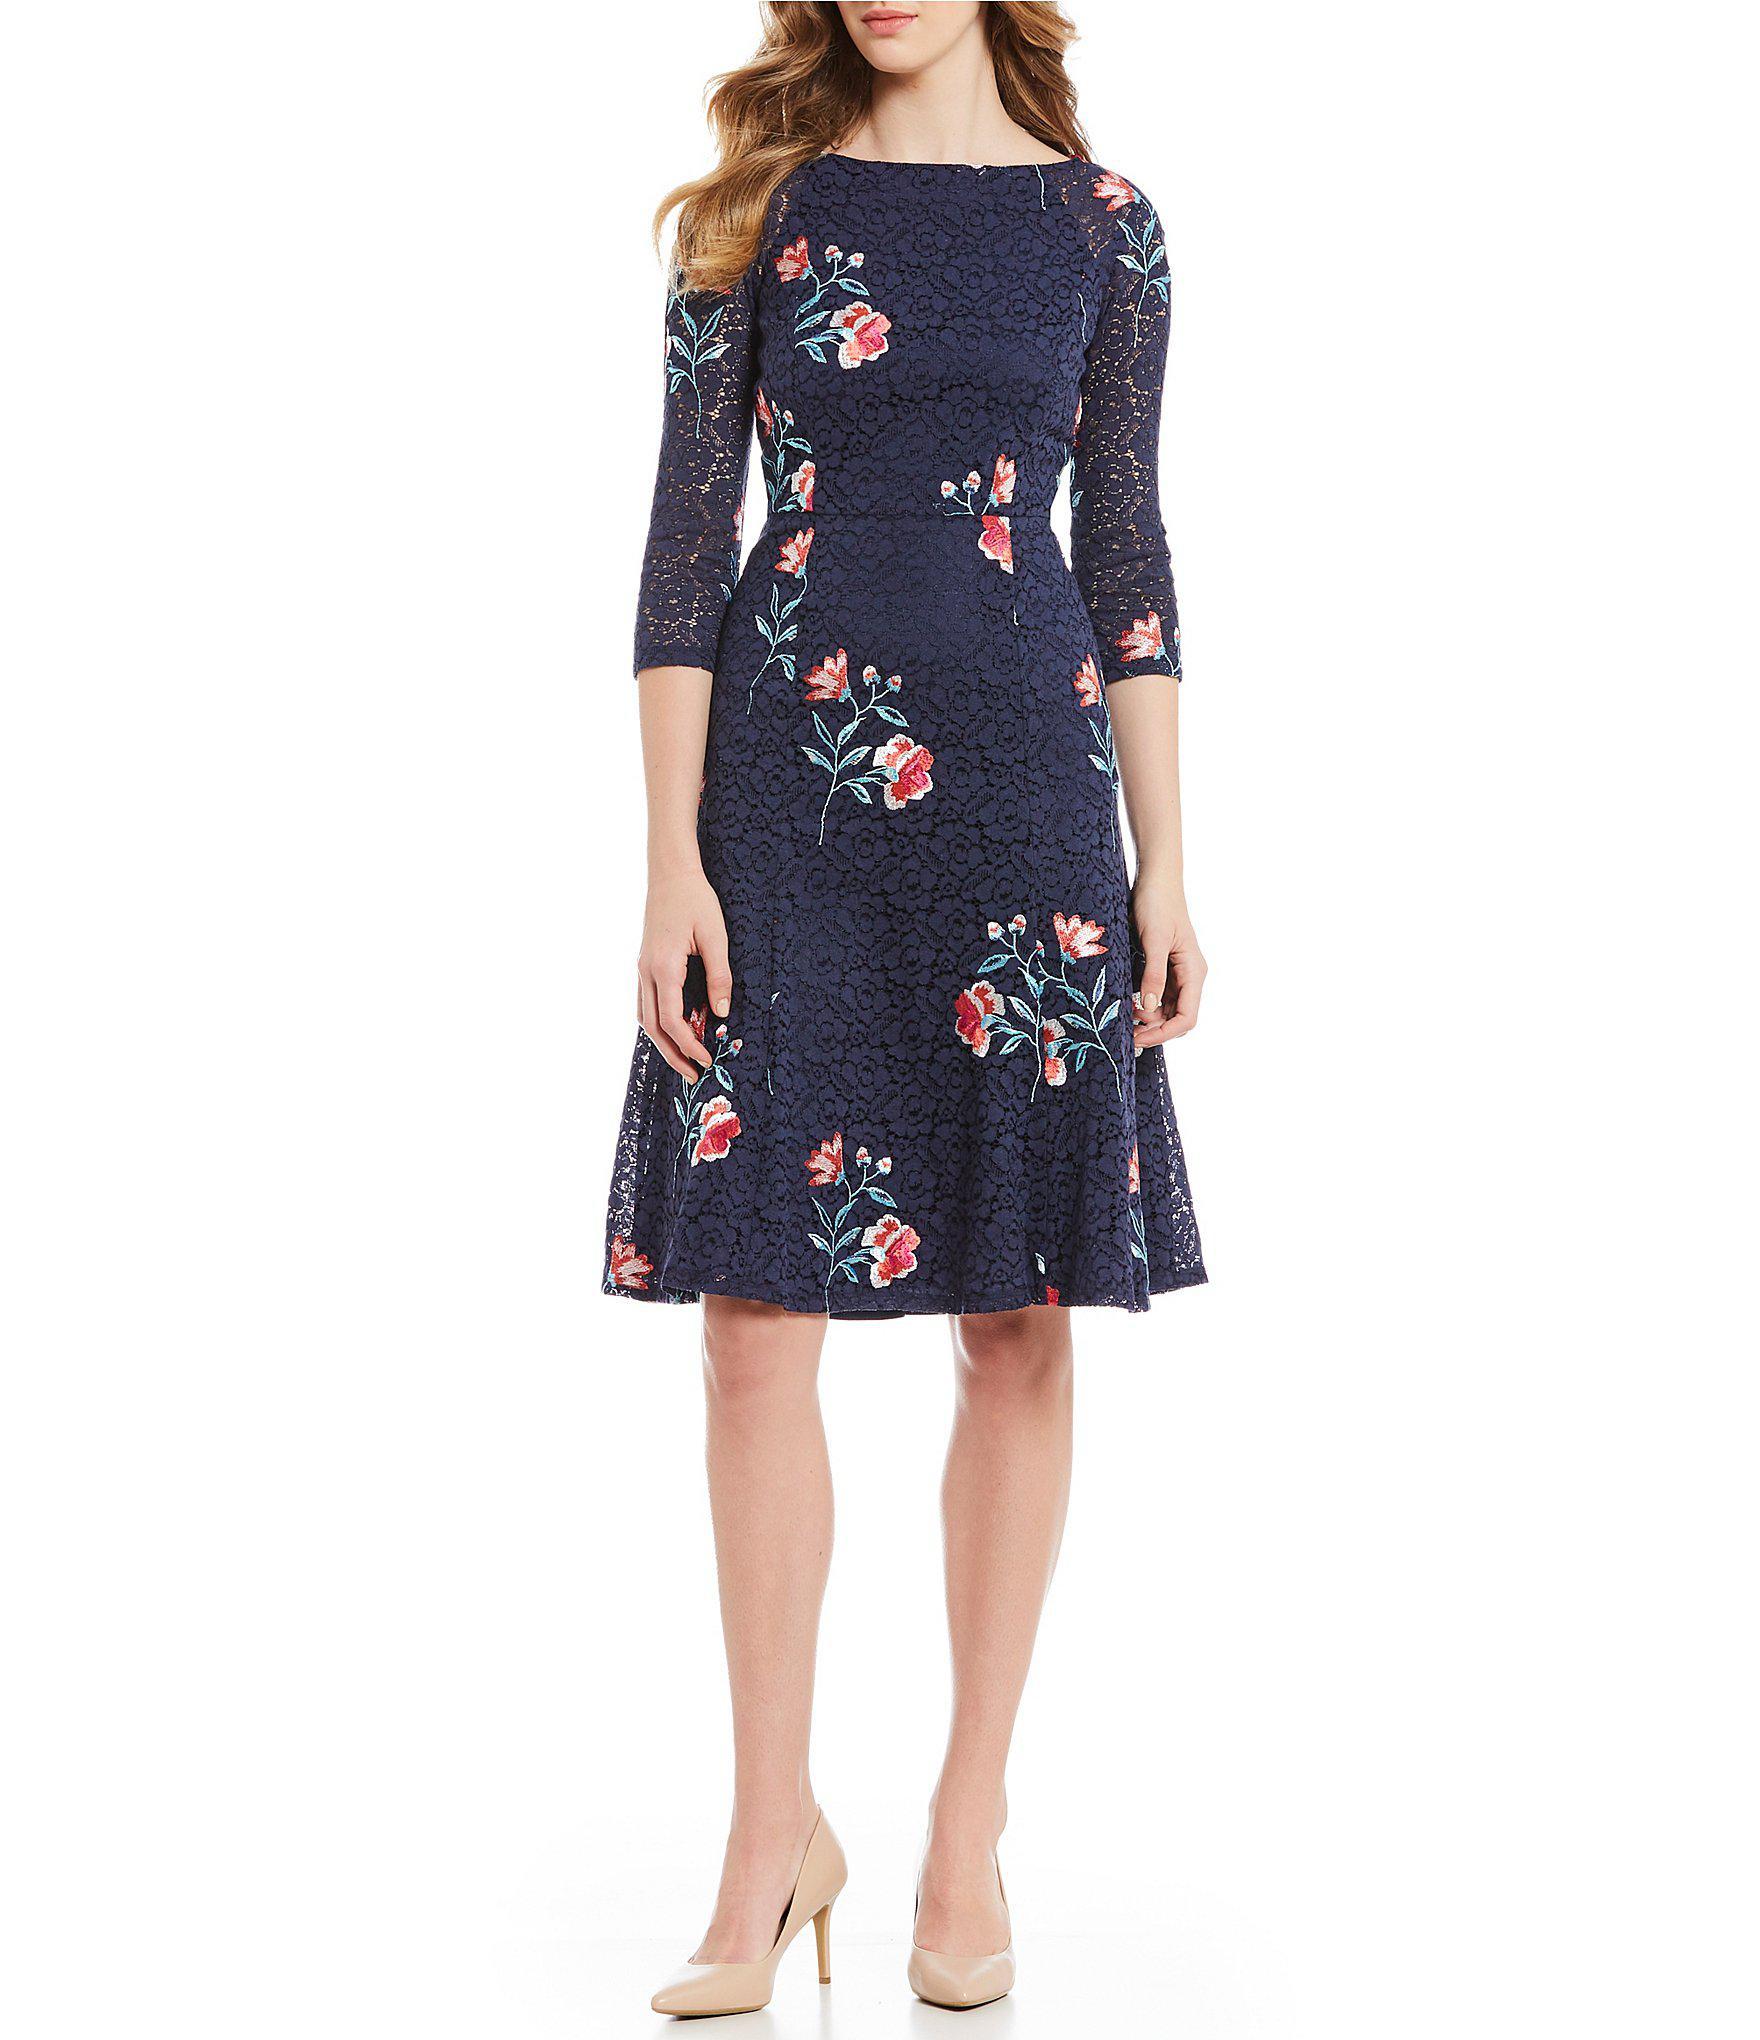 bf060a7e1f78 Lyst - Eliza J Floral Print Lace A-line Dress in Blue